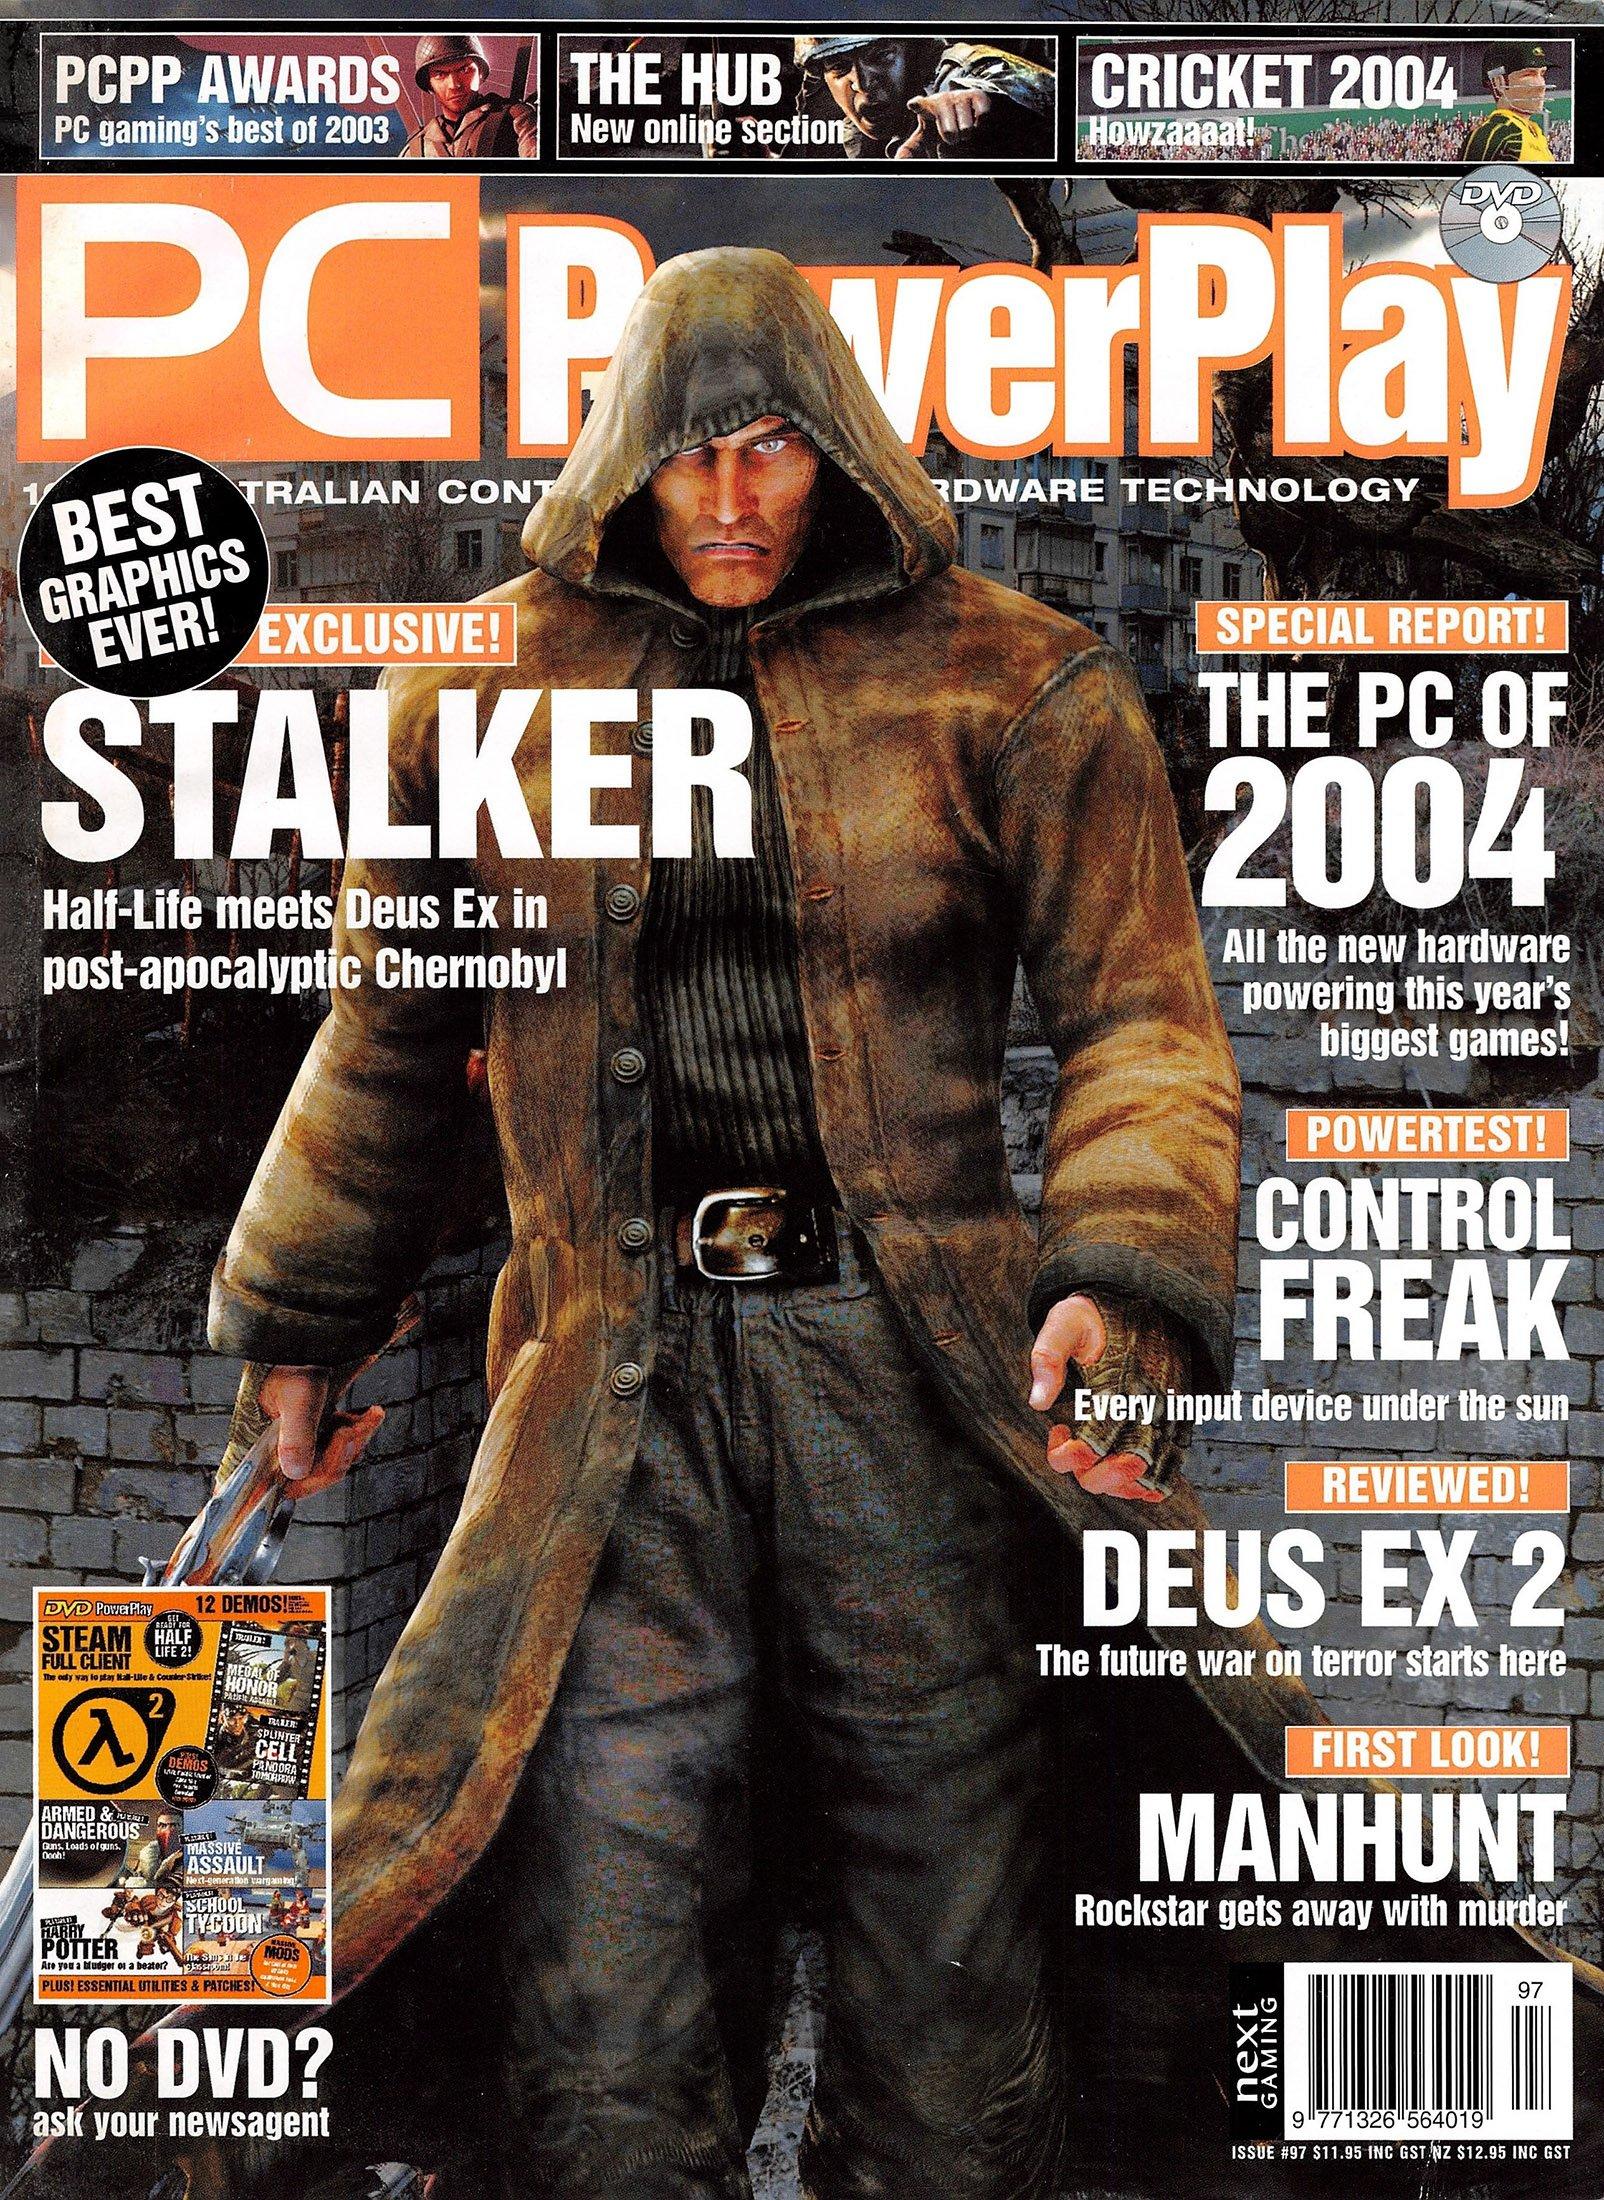 PC PowerPlay 097 (March 2004)